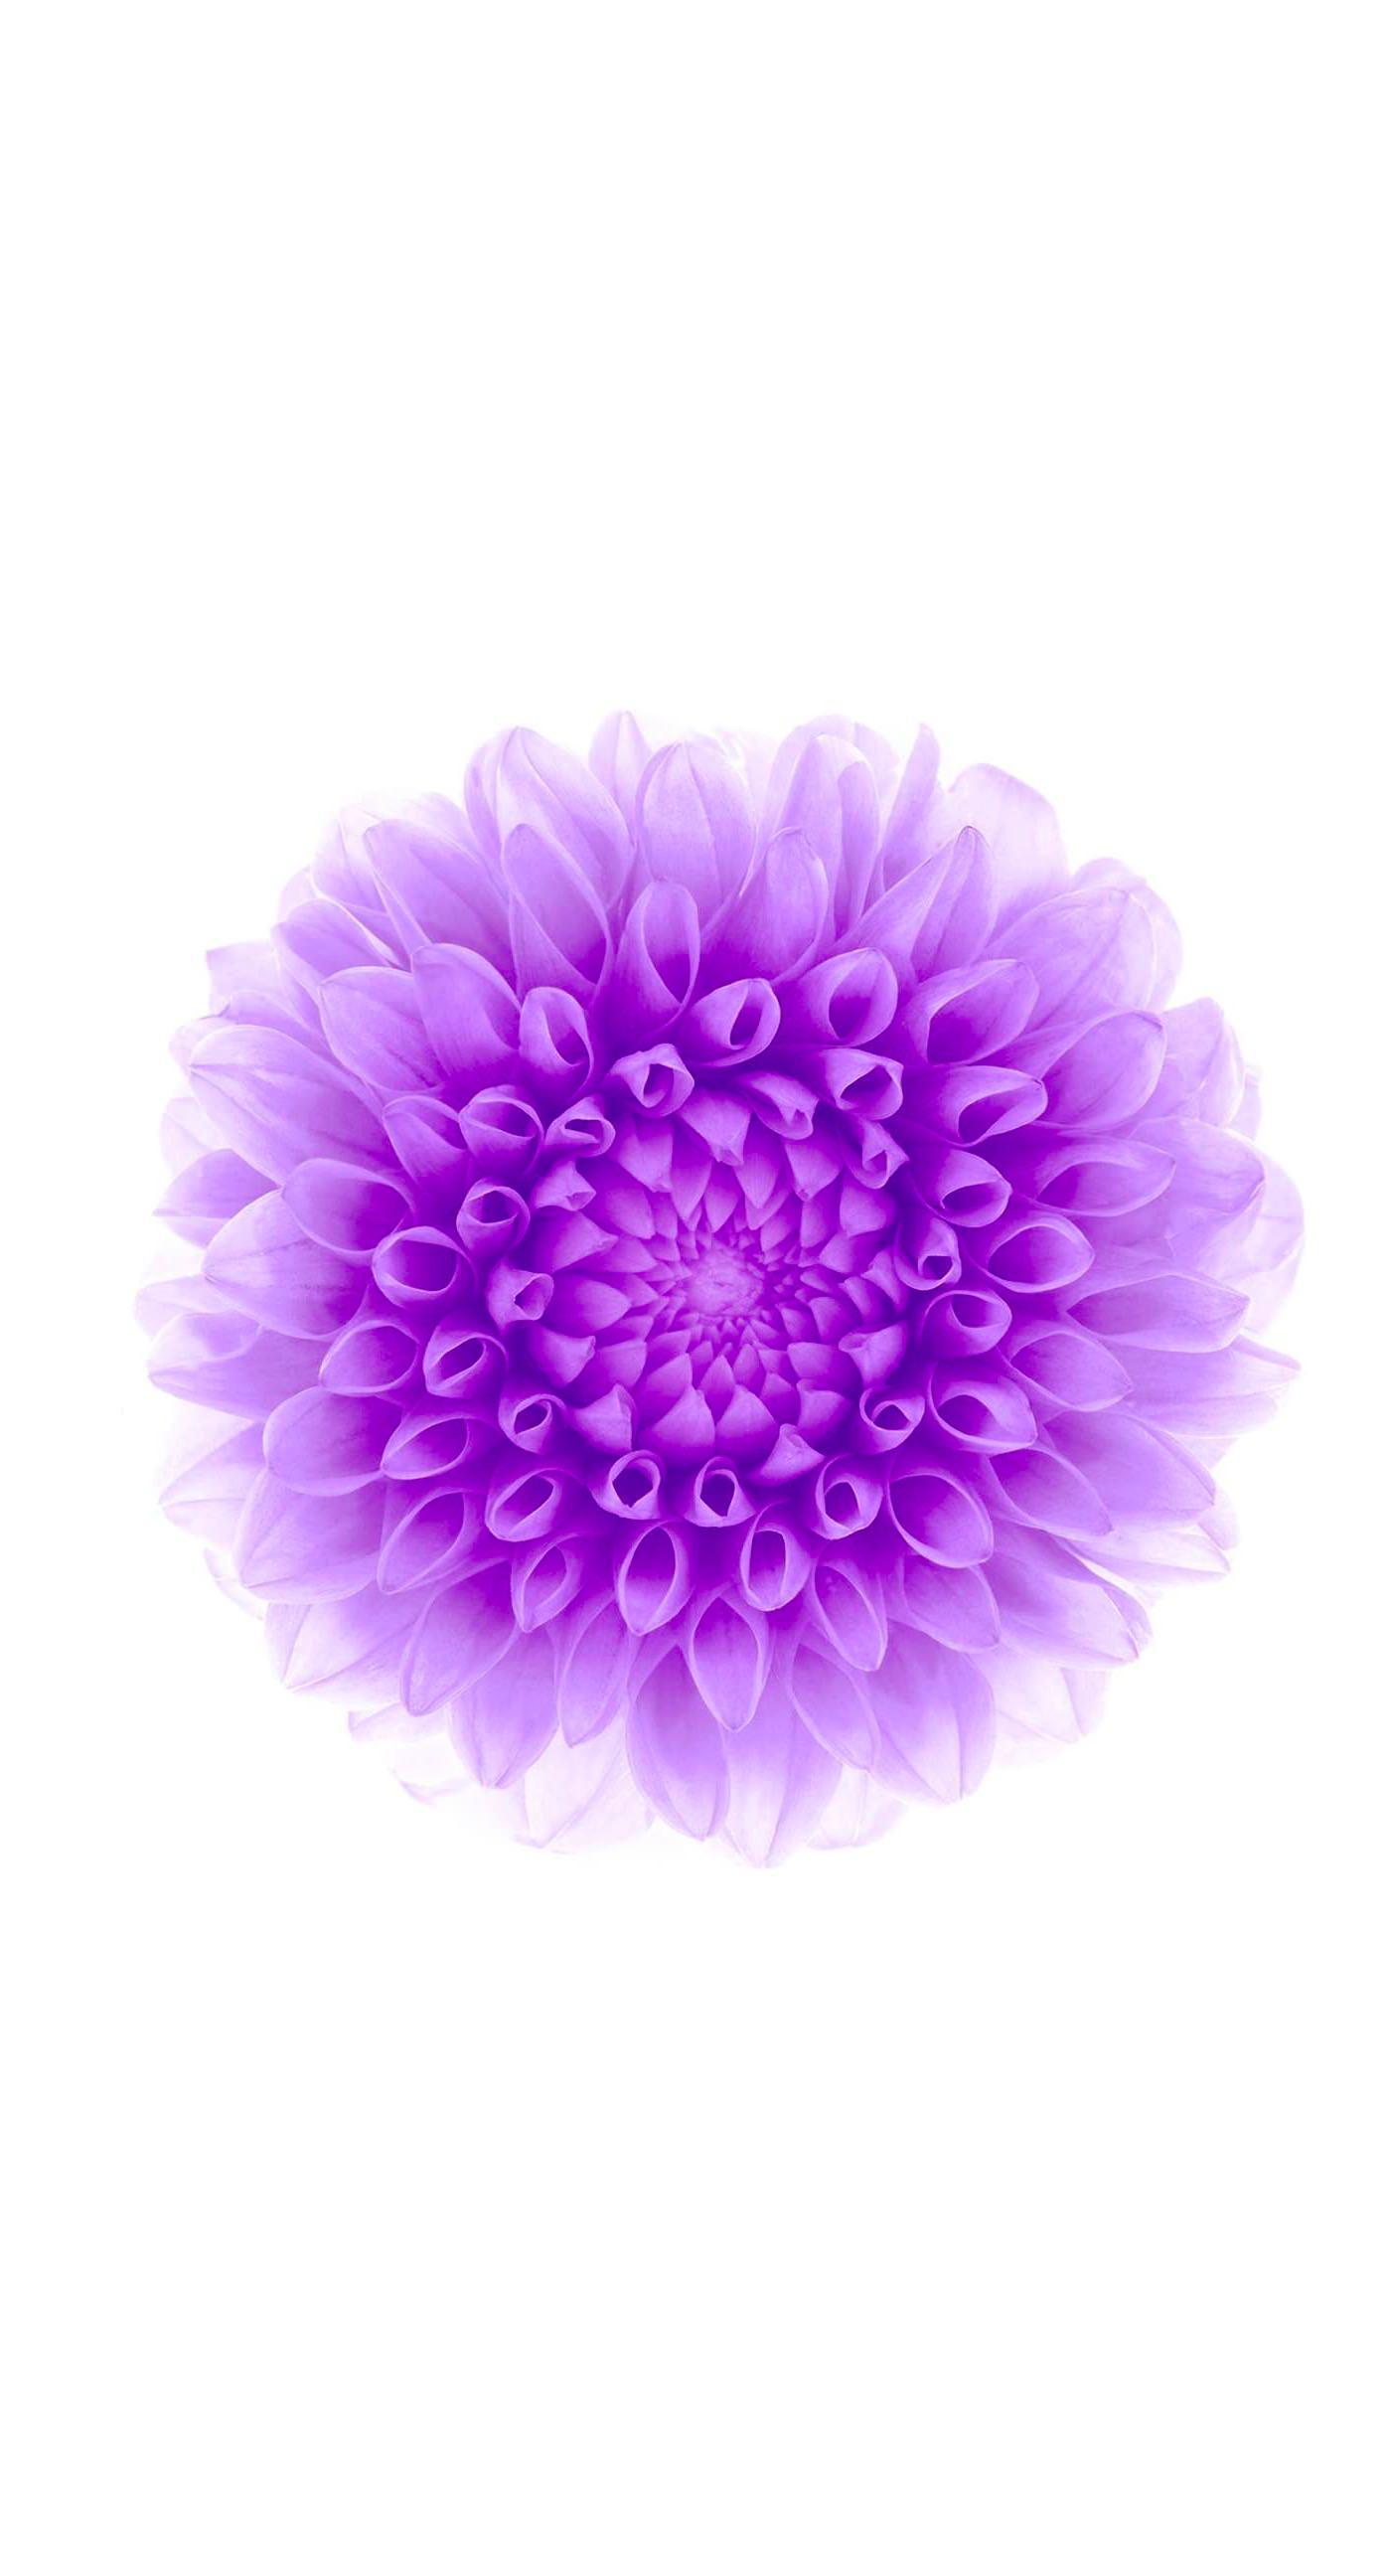 Bunga Ungu Putih Wallpapersc IPhone7Plus